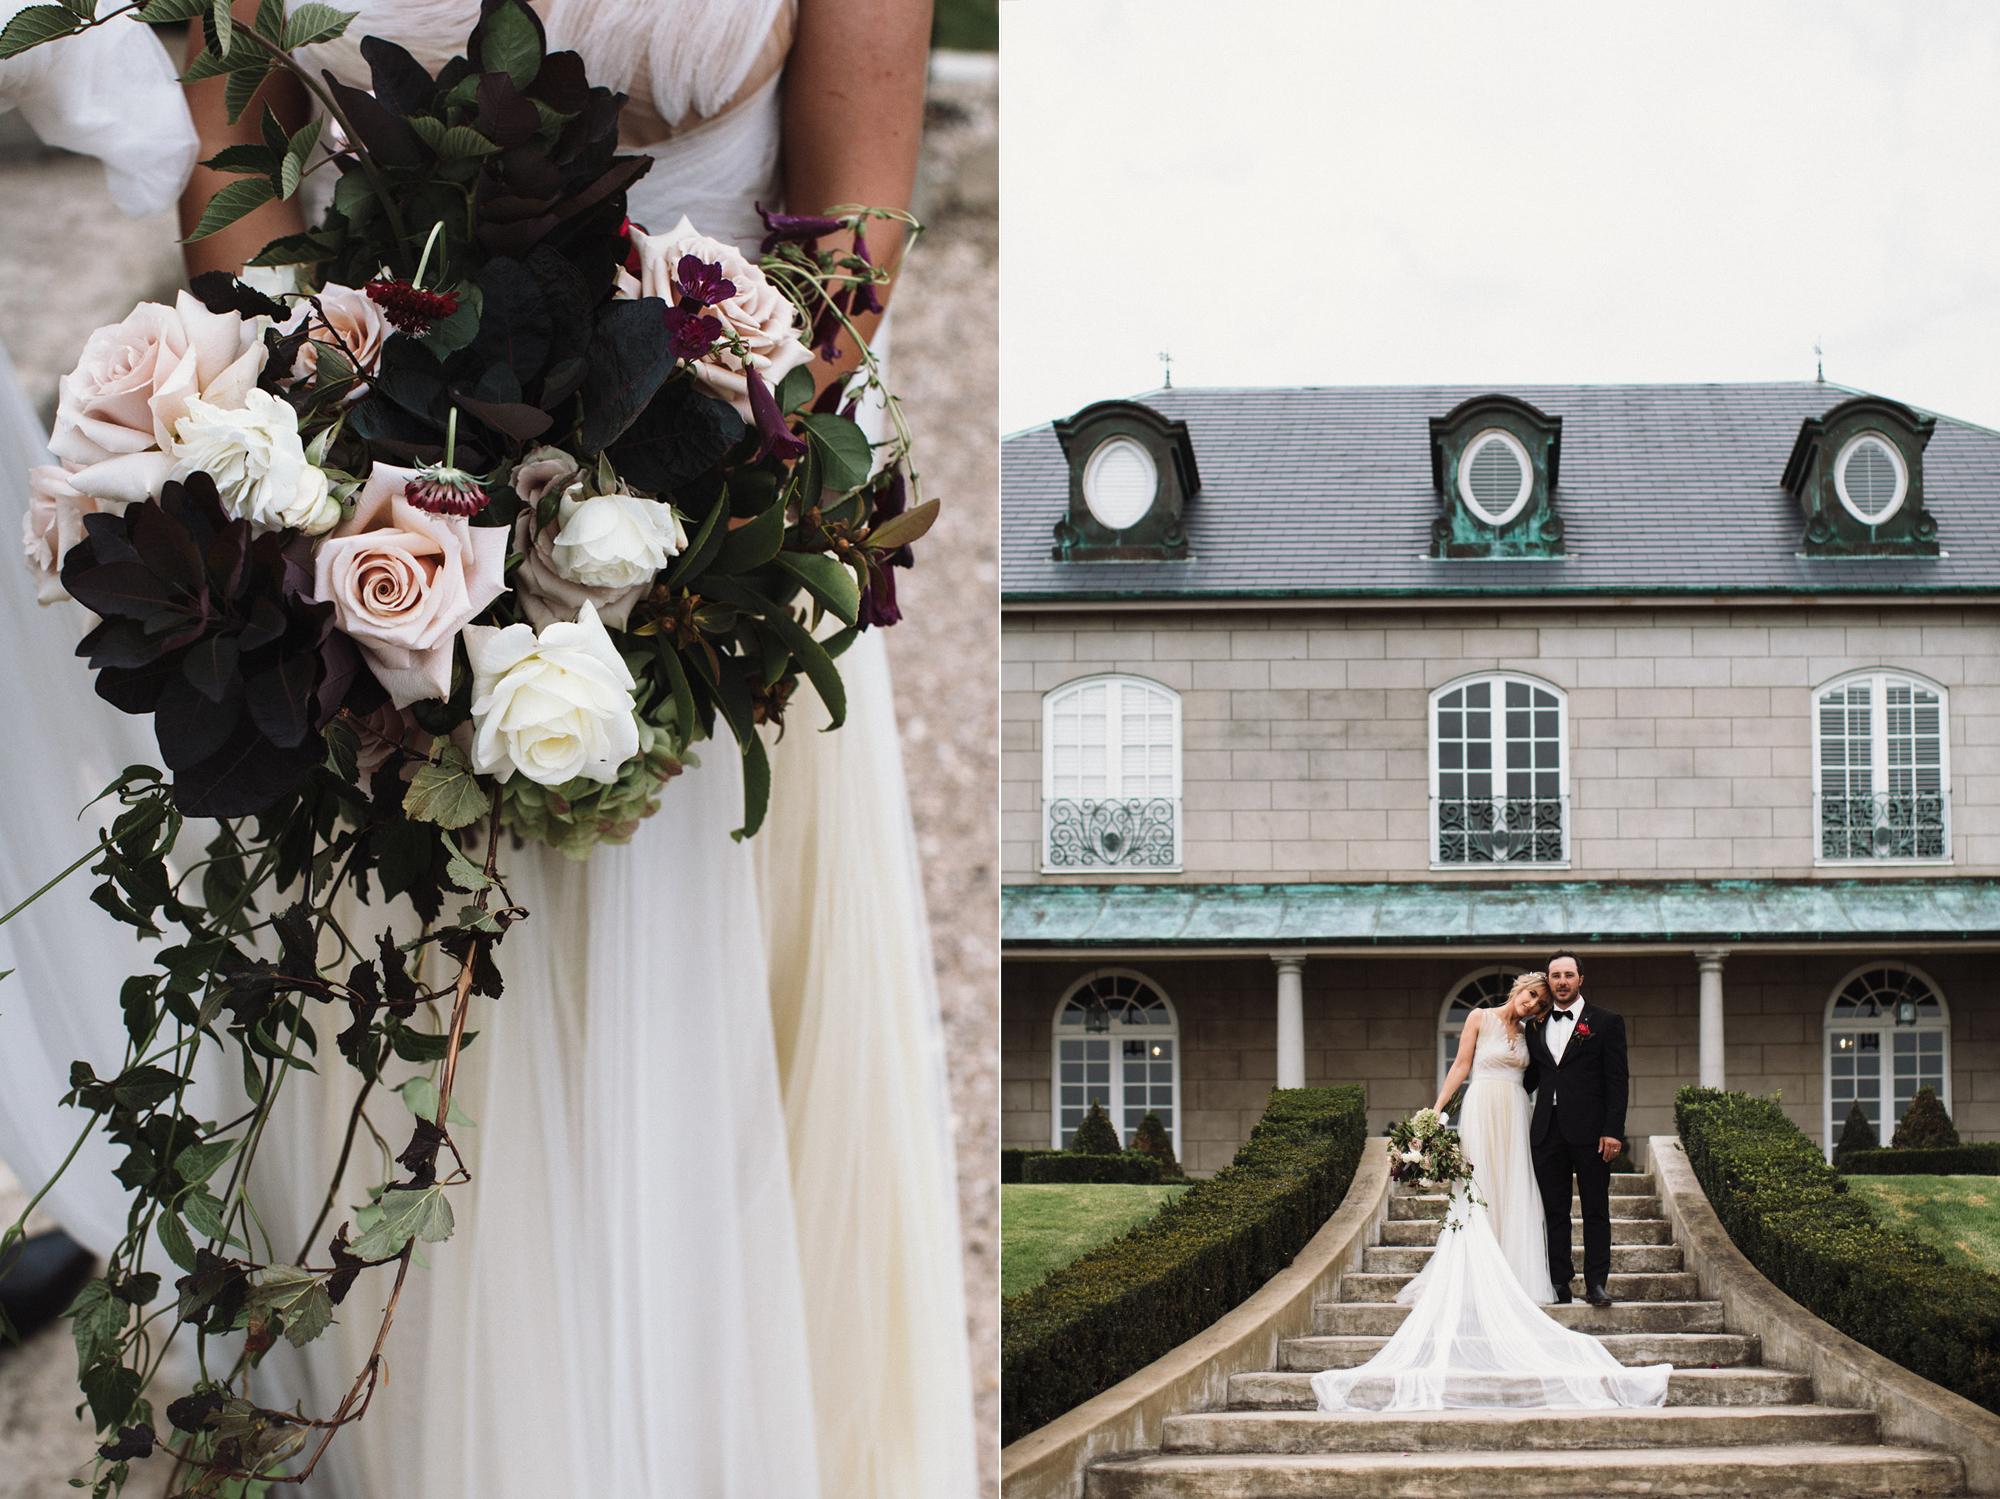 Campbell Point House Wedding HJ + Dean Raphael Weddings-90.jpg